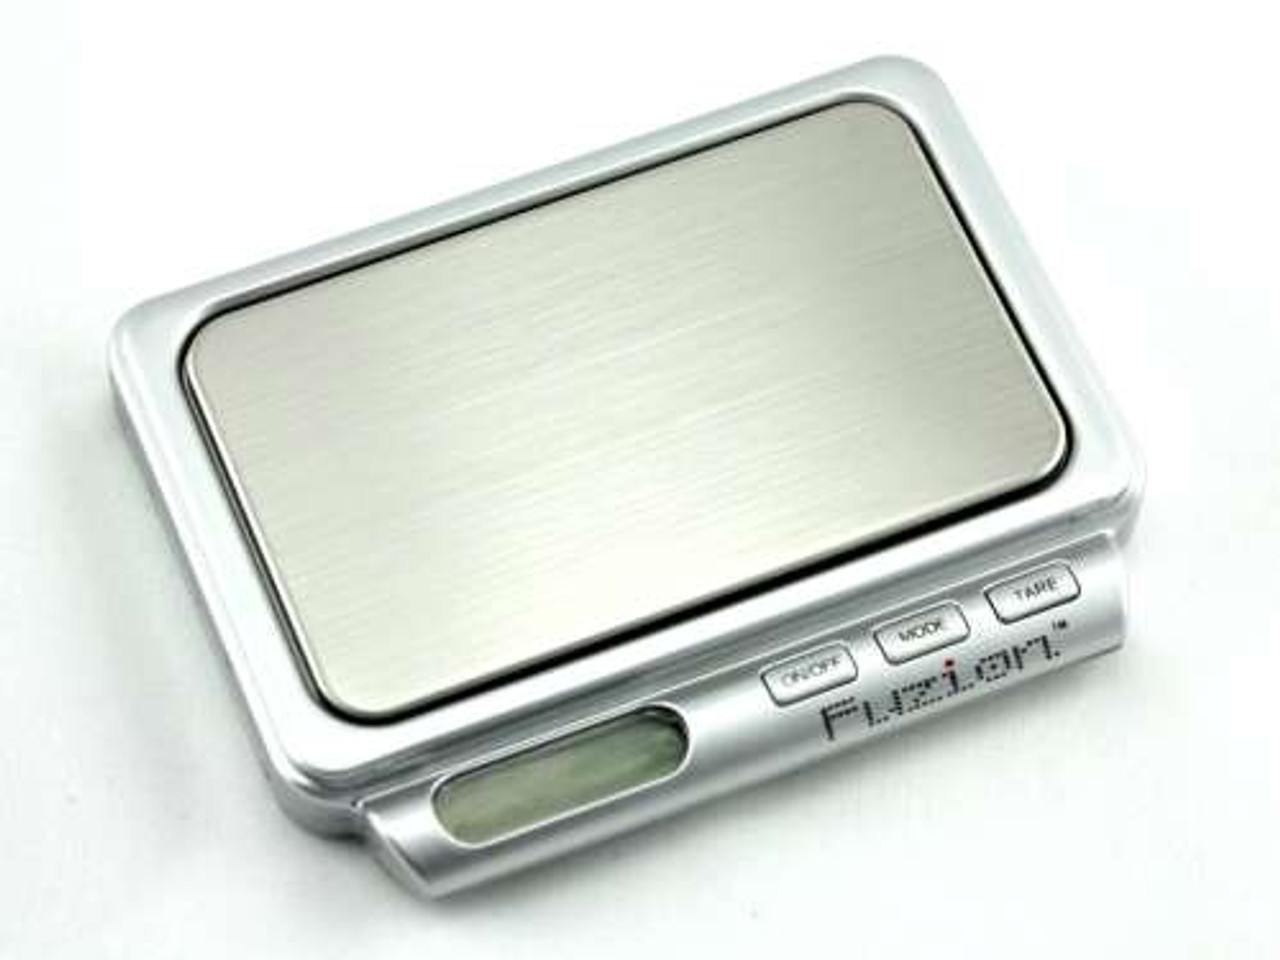 Fuzion Nitro Professional Digital Slim Pocket Scale